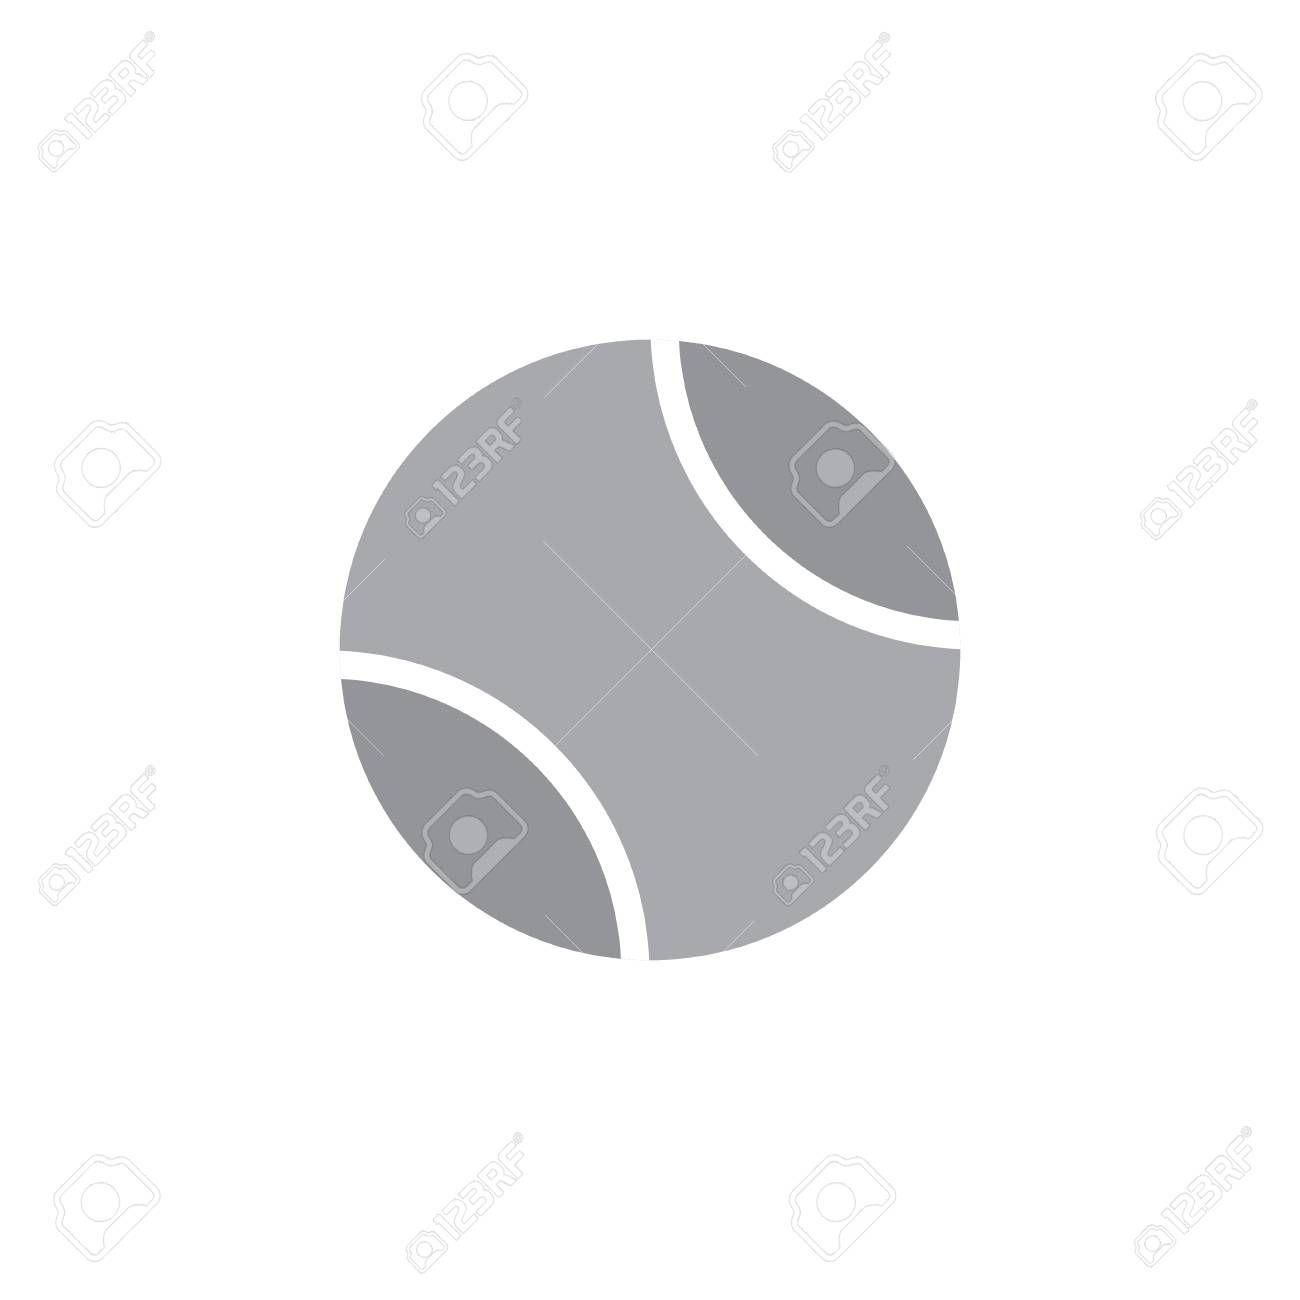 Tennis Ball Icon Vector Illustration Isolated On White Background Illustration Ad Icon Vector Tennis Vector Illustration White Background Pie Chart